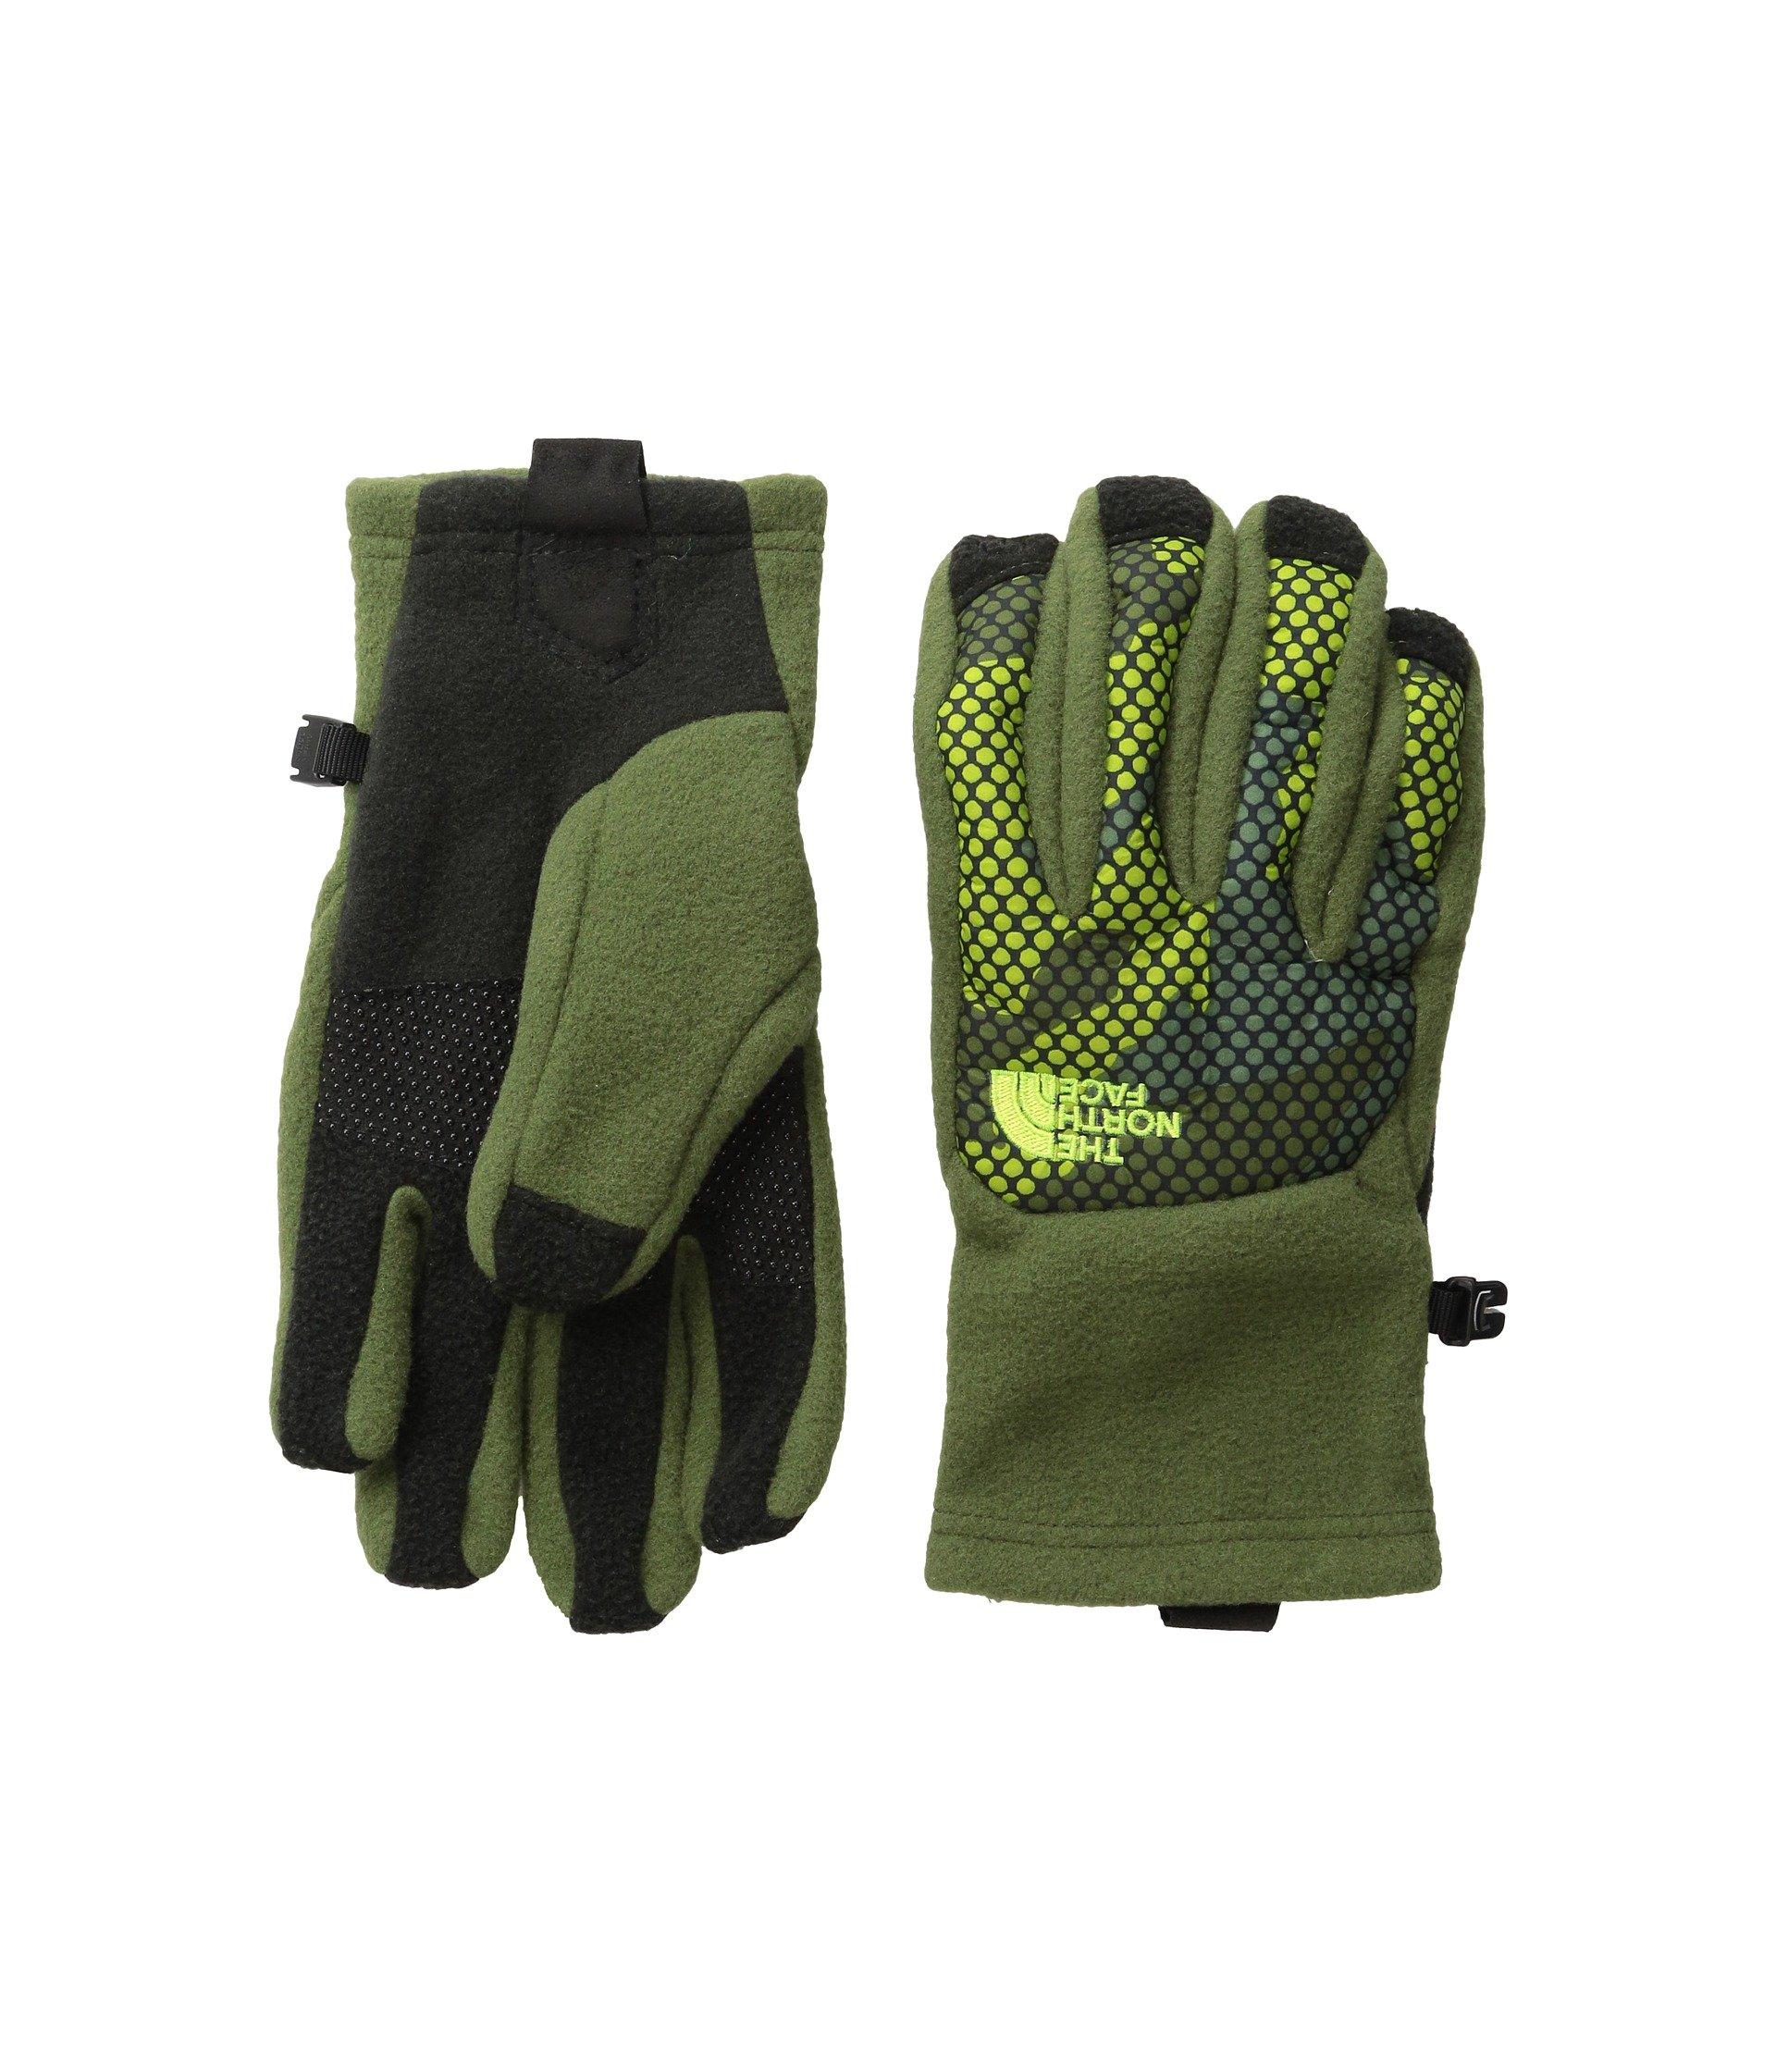 Guantes para Niña The North Face Kids Denali Etip Gloves (Big Kids)  + The North Face en VeoyCompro.net